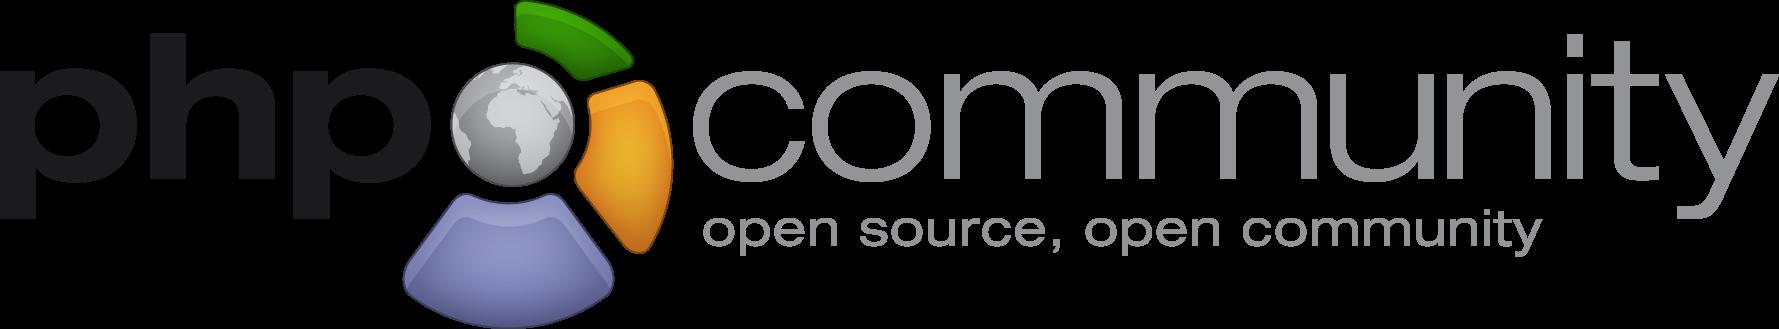 PHP Community Logo